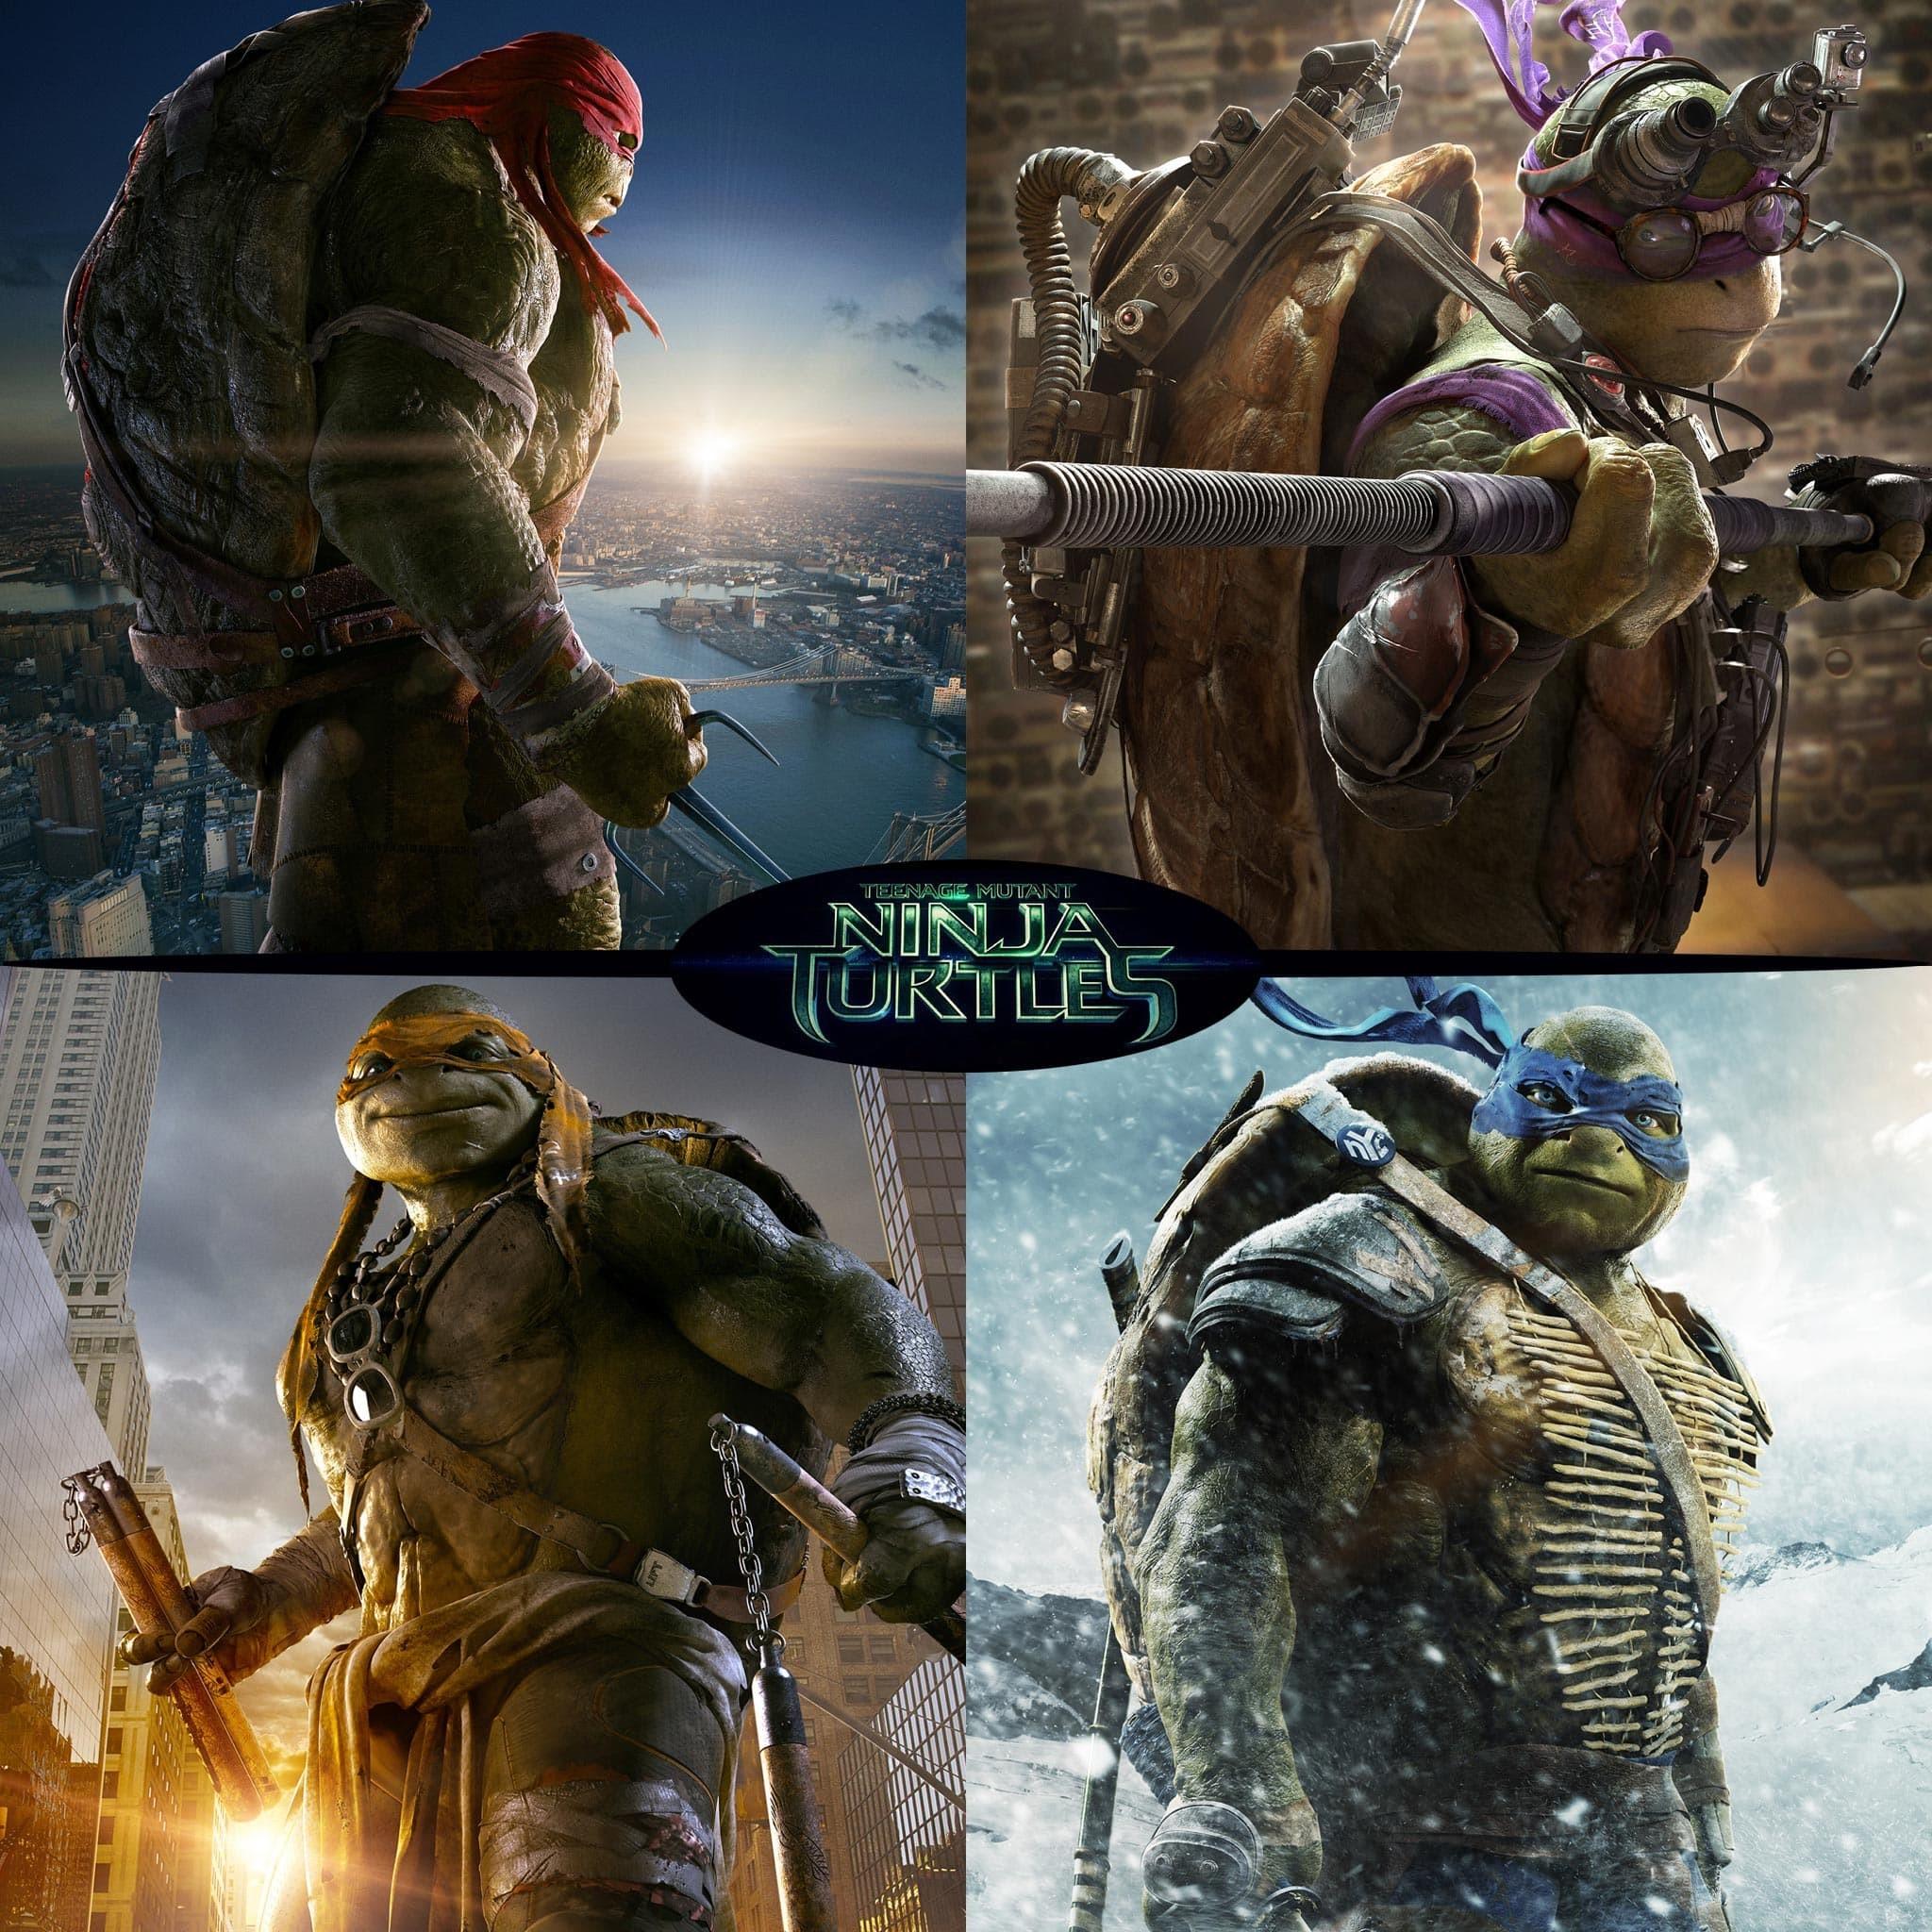 Teenage Mutant Ninja Turtles 2014 1371657 Hd Wallpaper